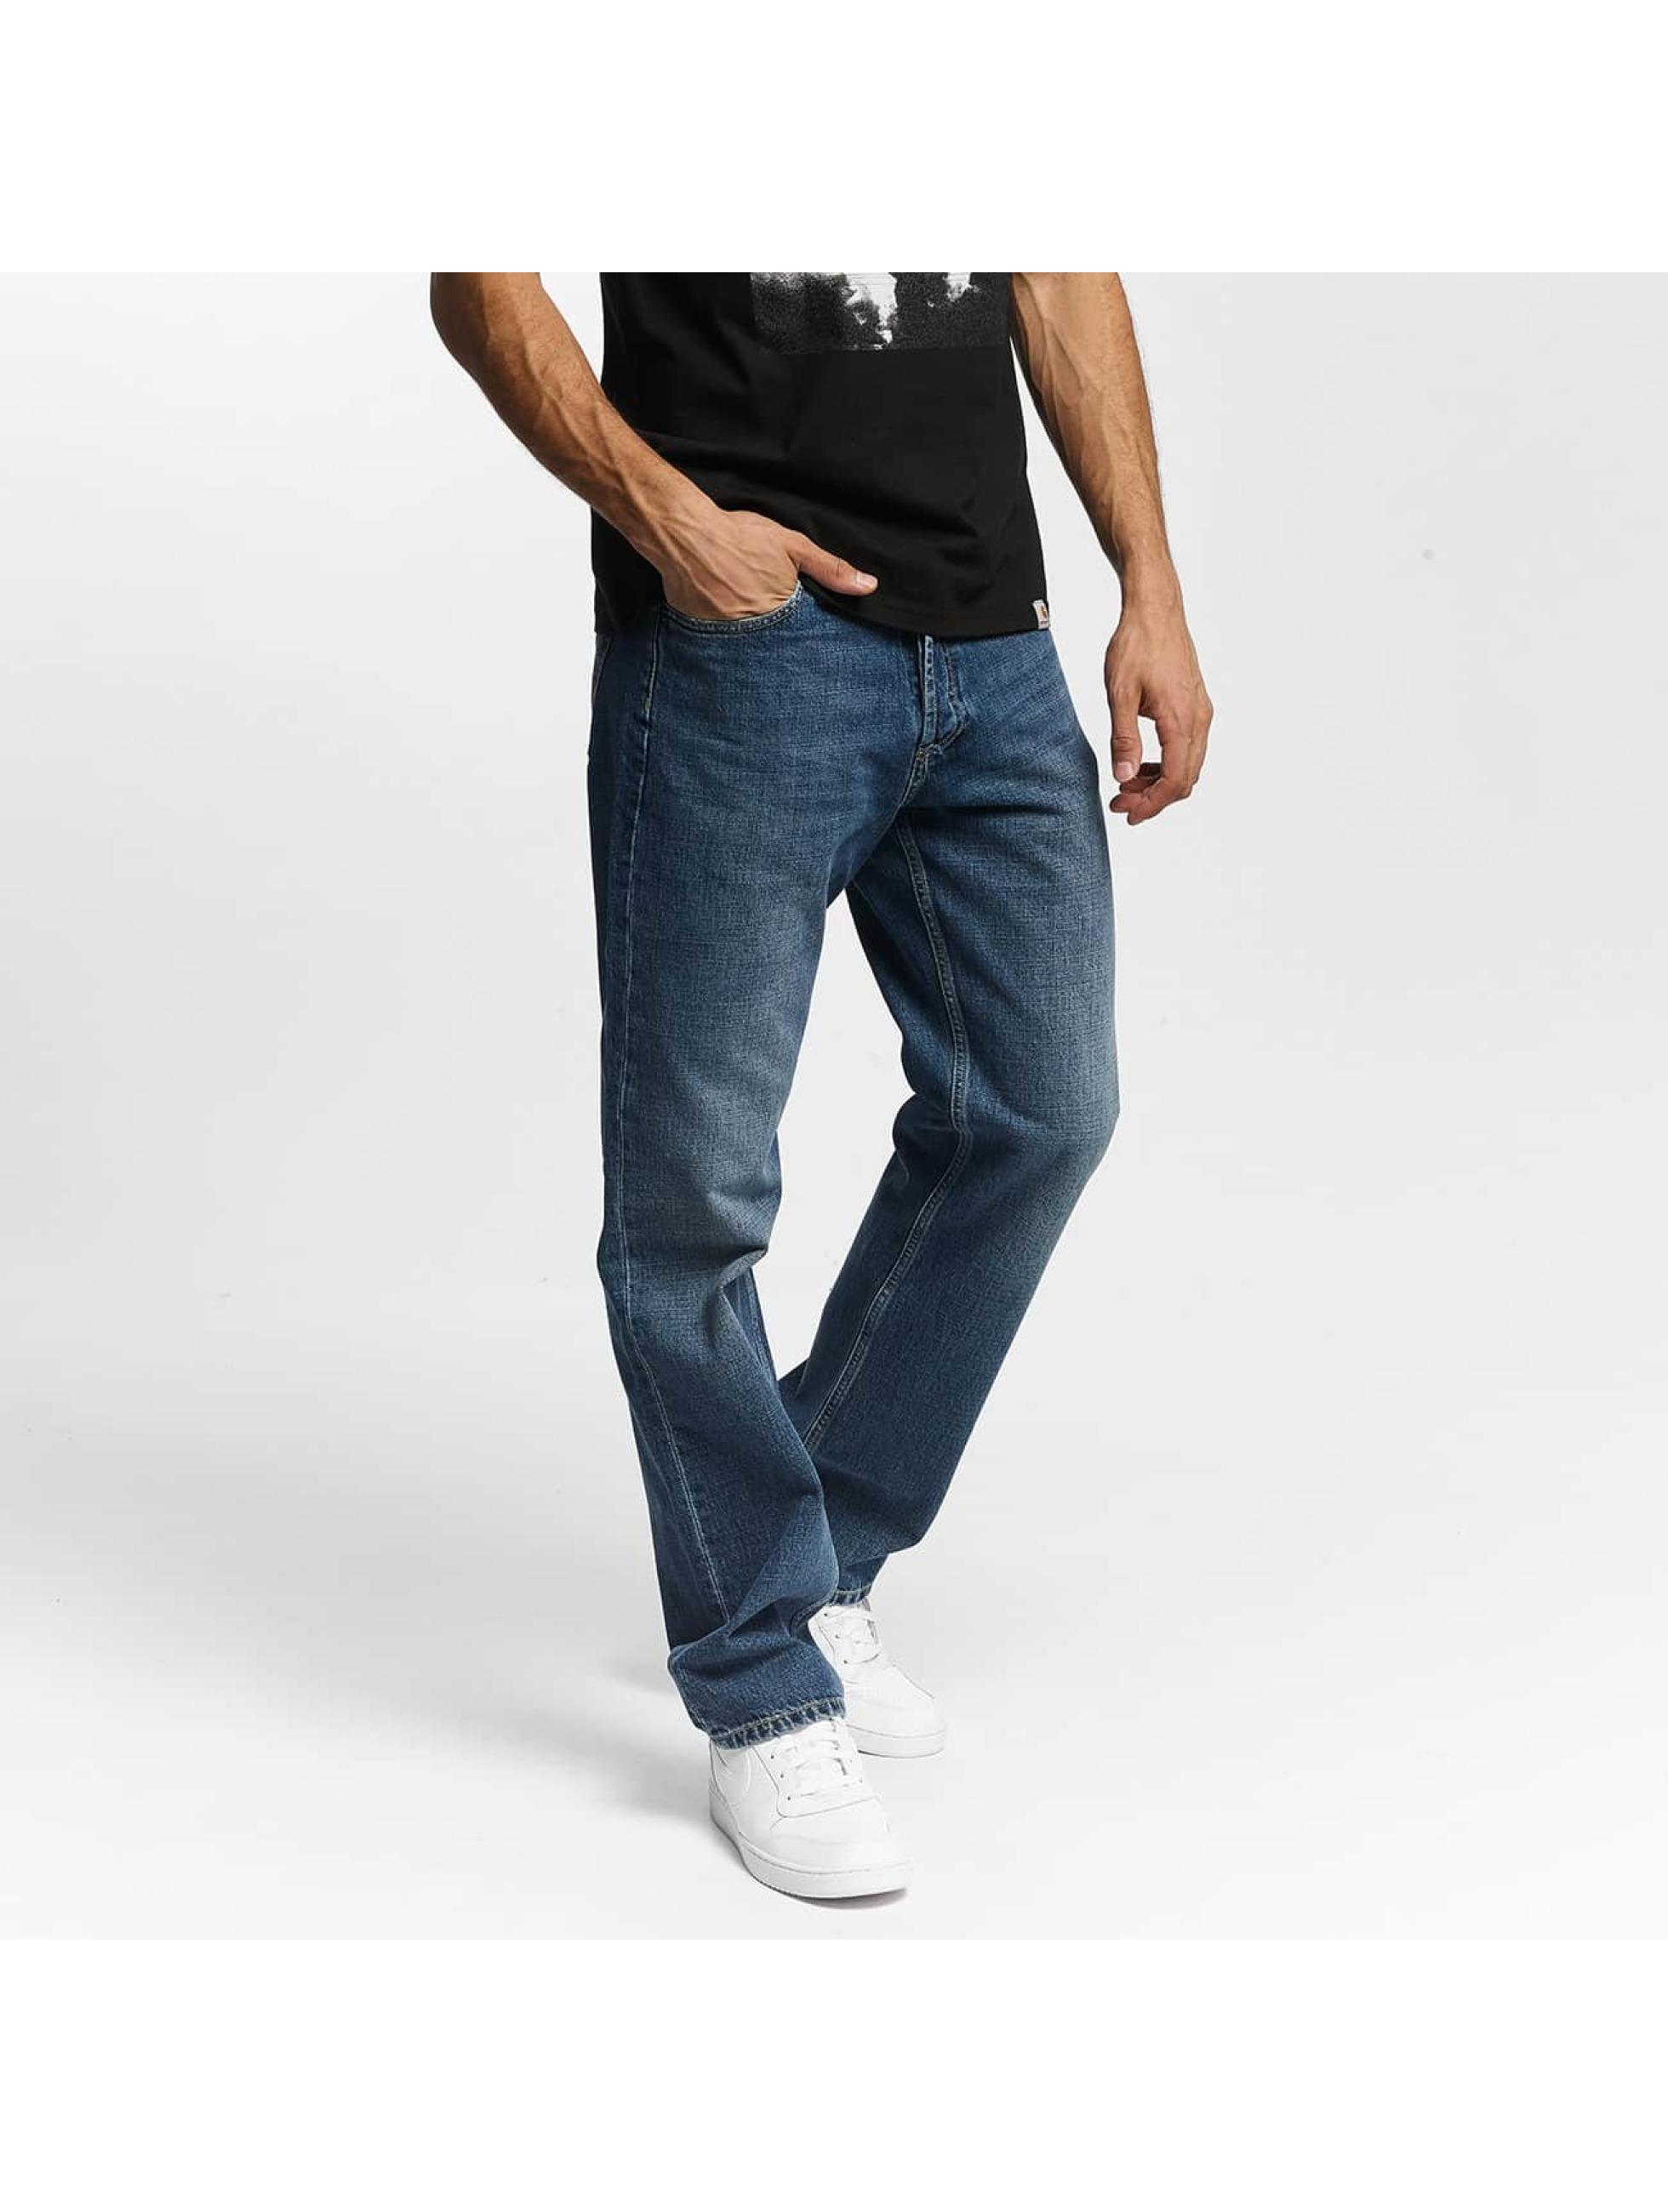 Carhartt WIP Männer Straight Fit Jeans Edgewood Marlow in blau